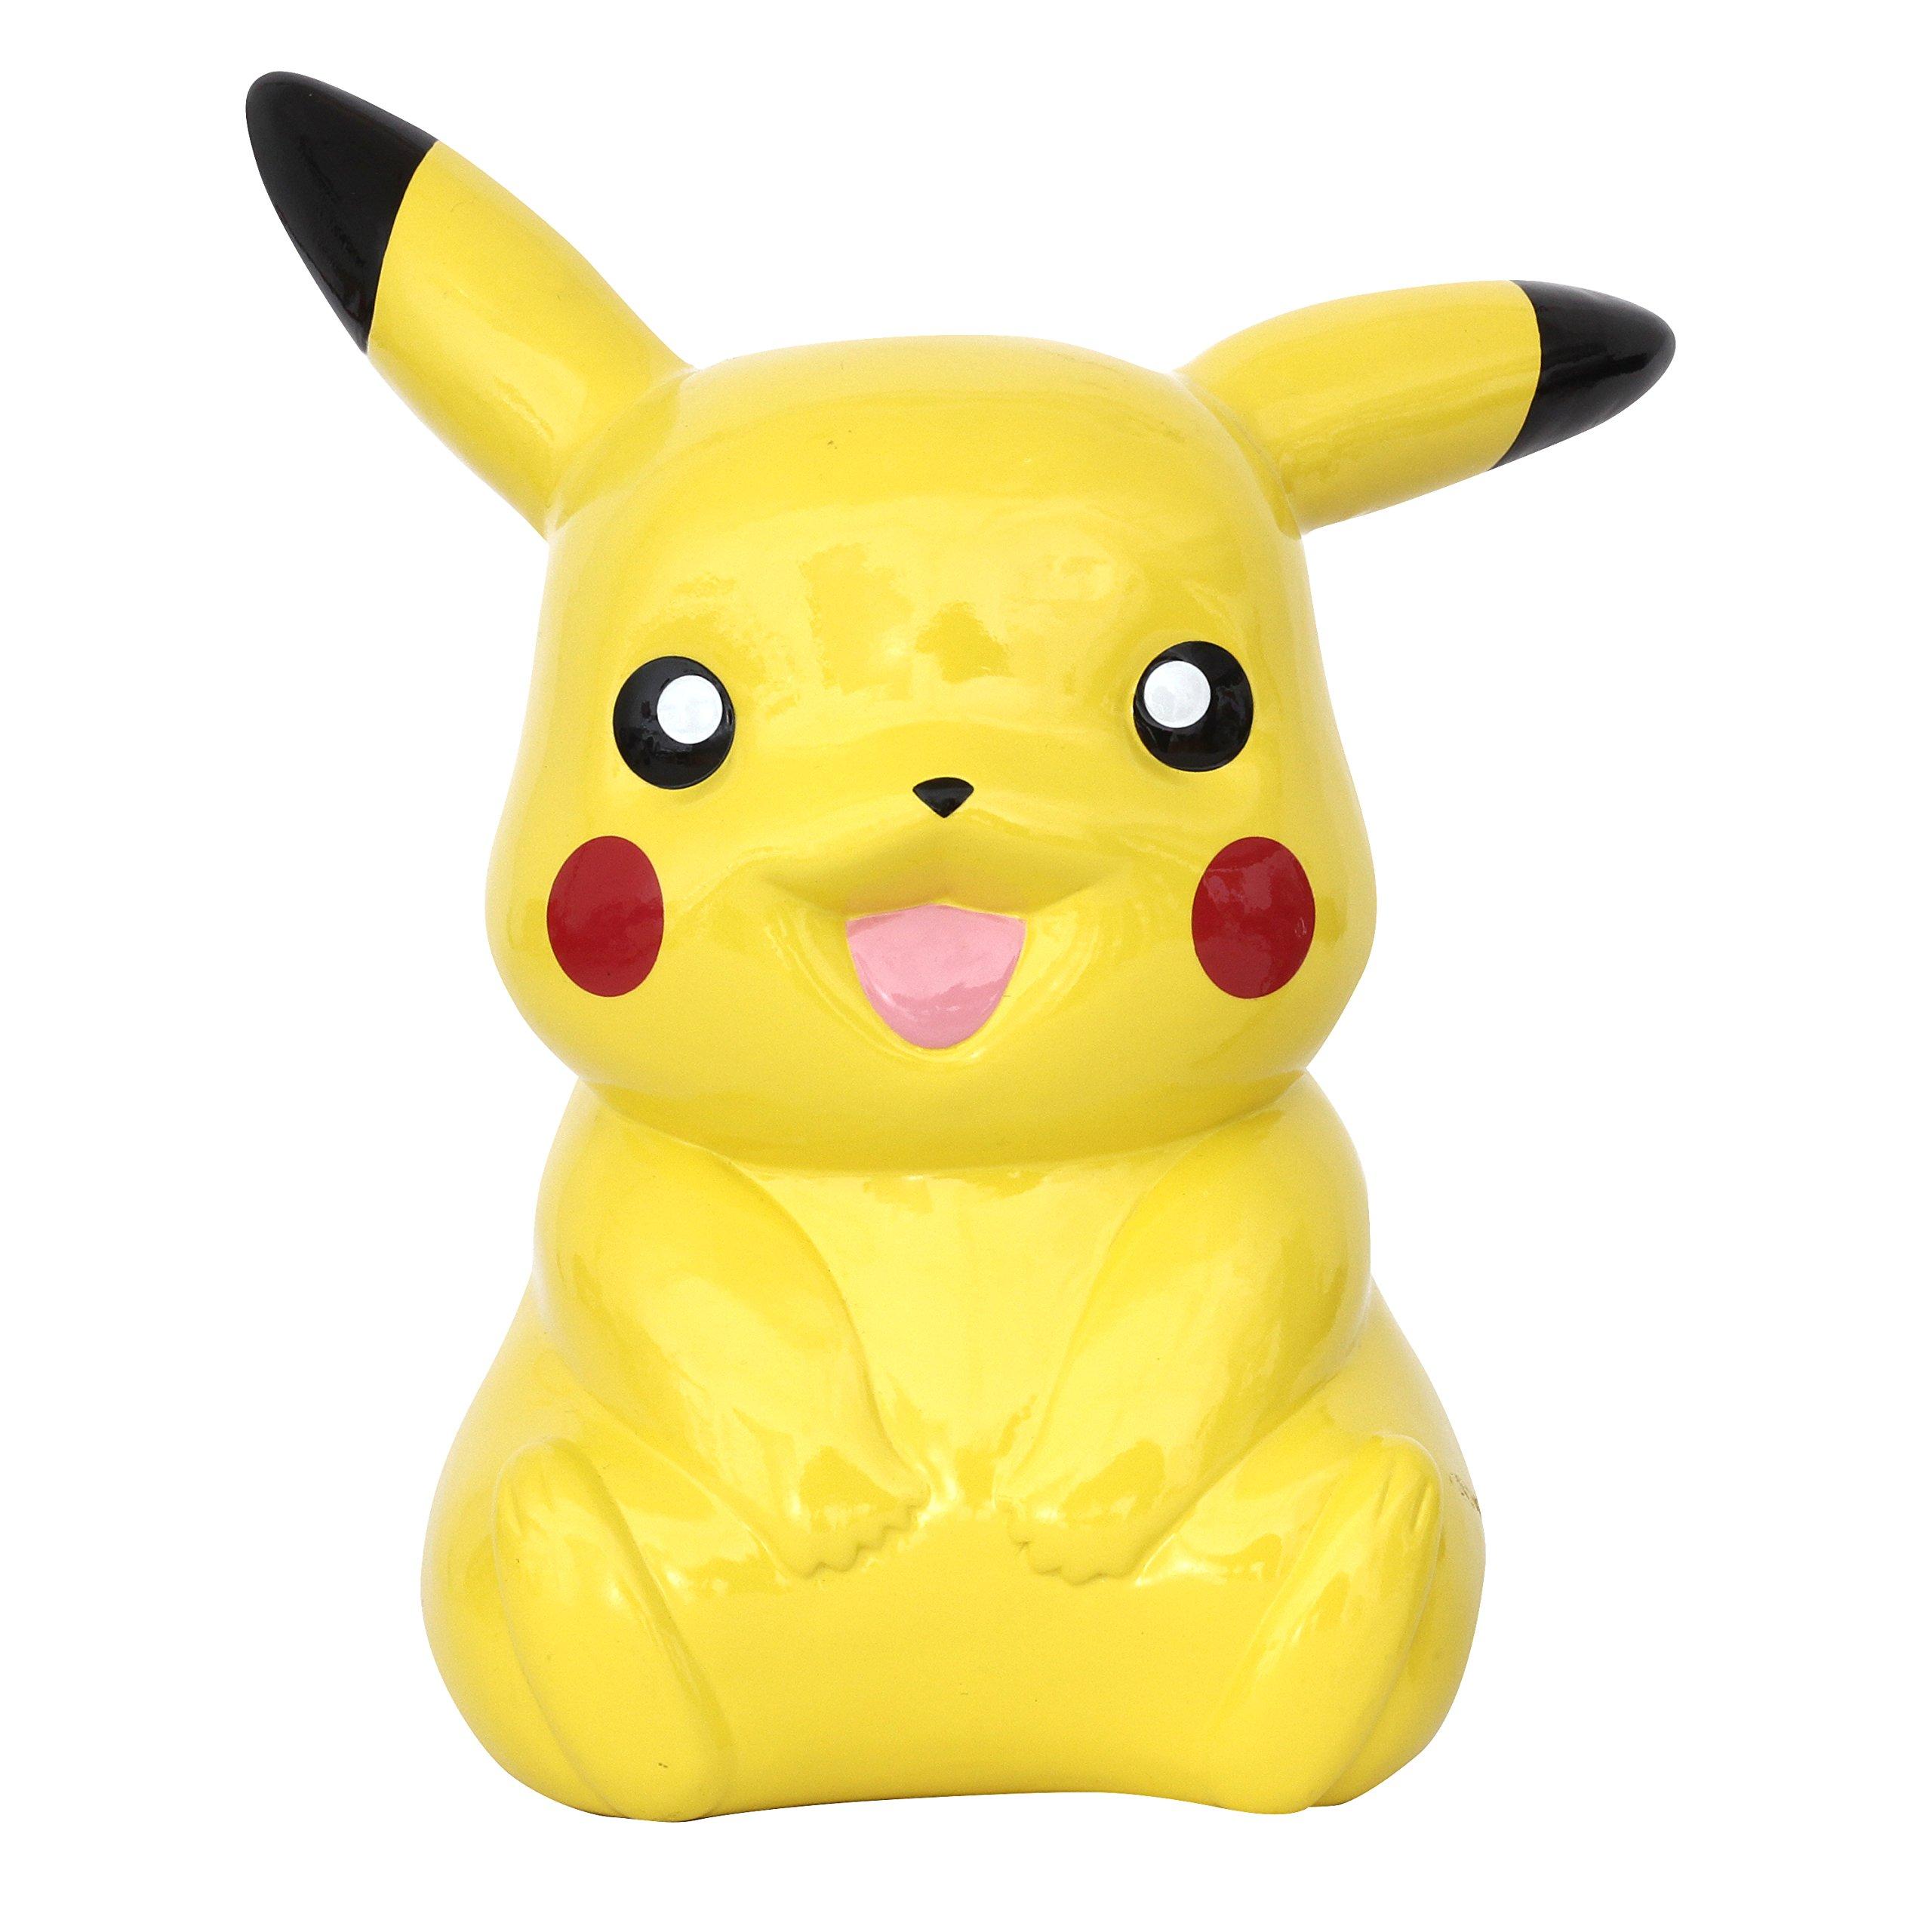 Fab Star Kid's Pikachu Bank, Yellow by Pokémon (Image #1)